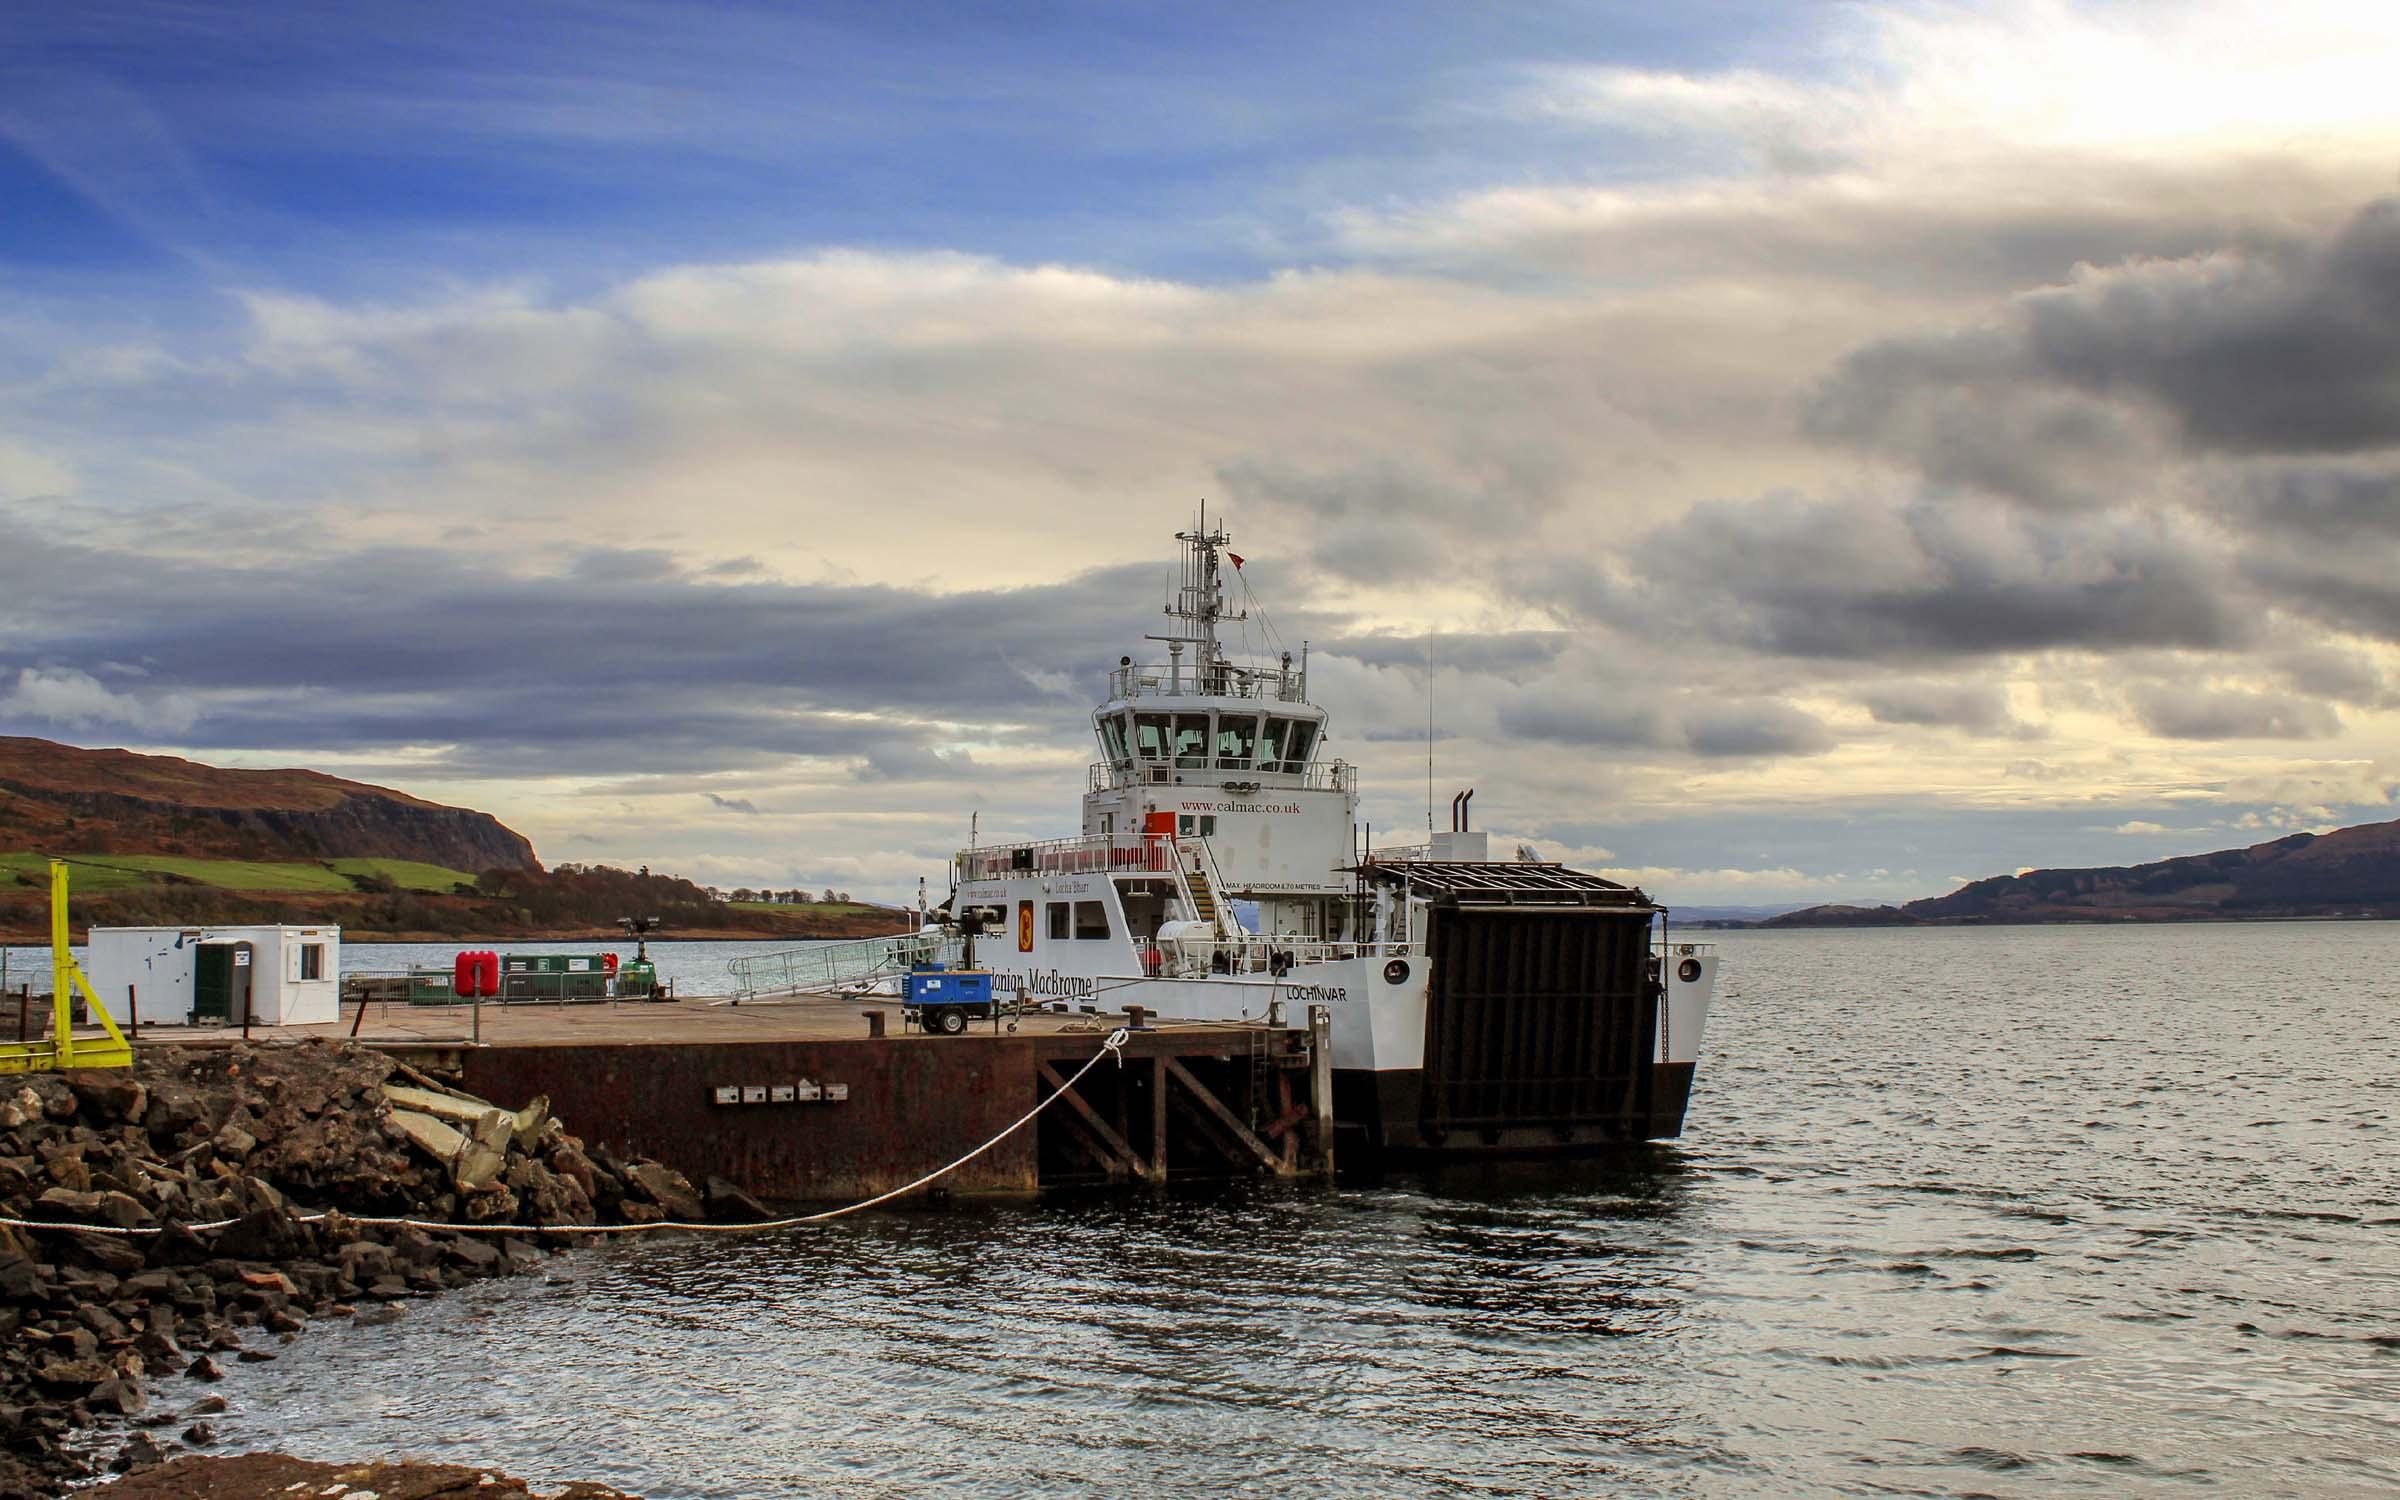 Lochinvar loading at Lochaline's steamer pier (Ships of CalMac)